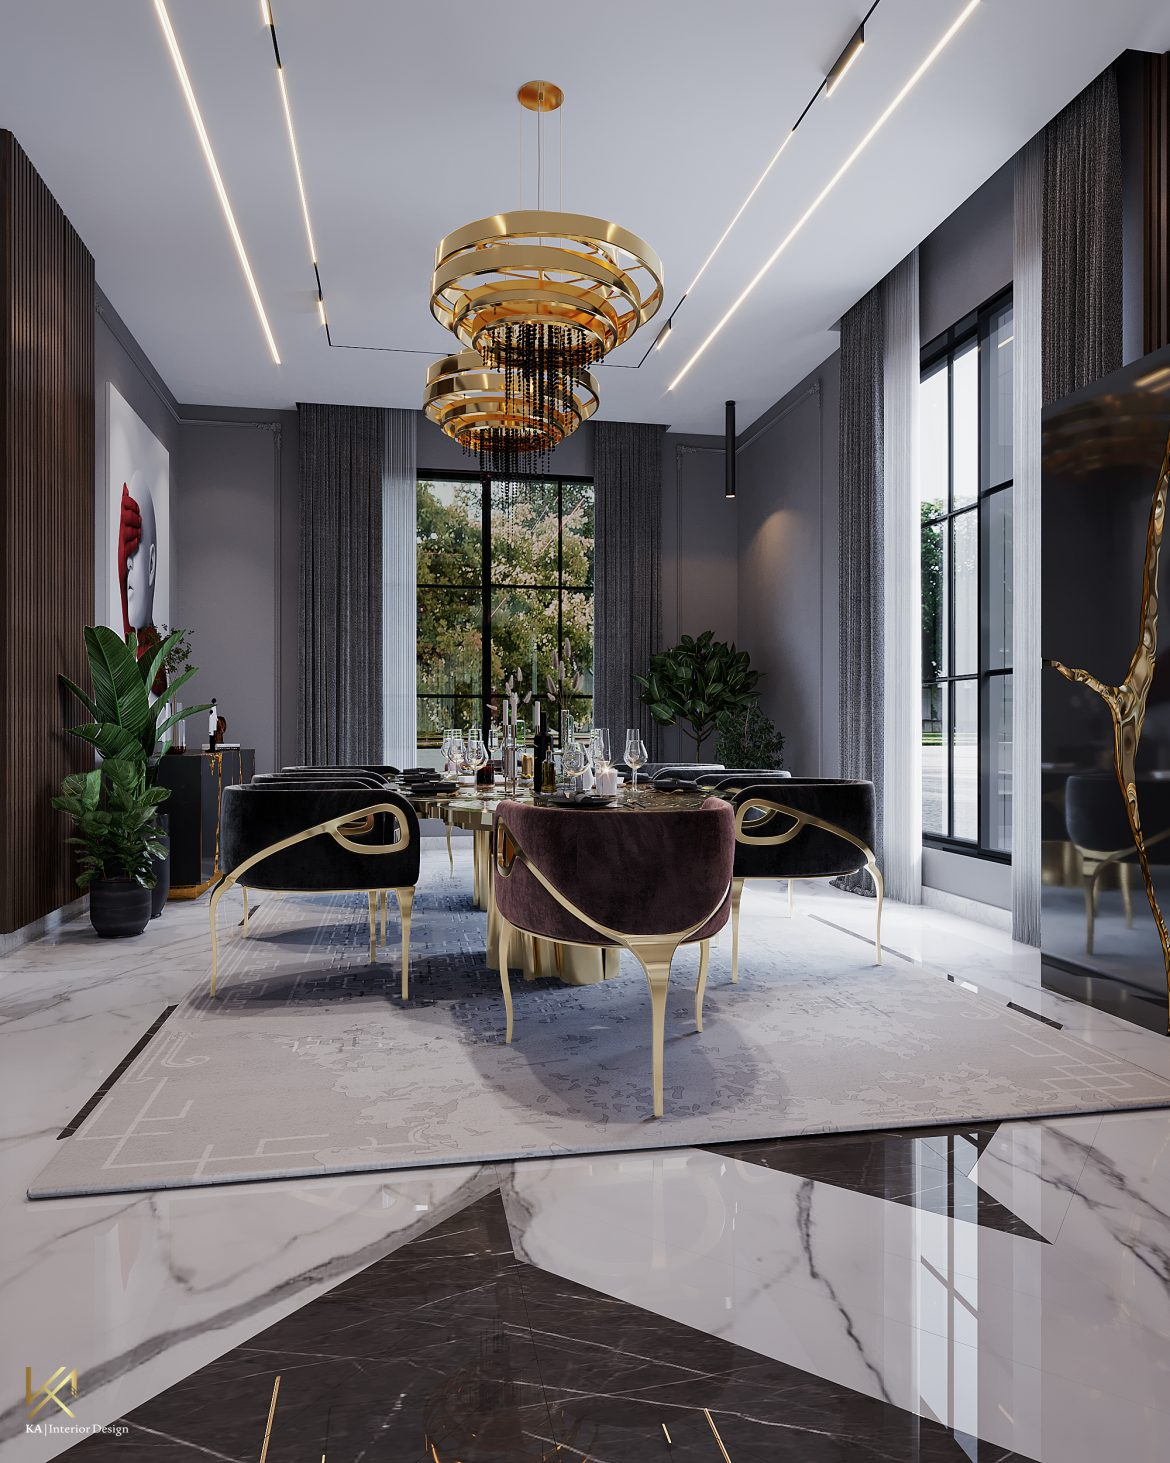 Covet House x K.A Interior Design: A Opulent Modern Classic Villa in Riyadh  Covet House x K.A Interior Design:  A Opulent Modern Classic Villa In Riyadh covet house k a interior design lavish modern classic villa riyadh 2